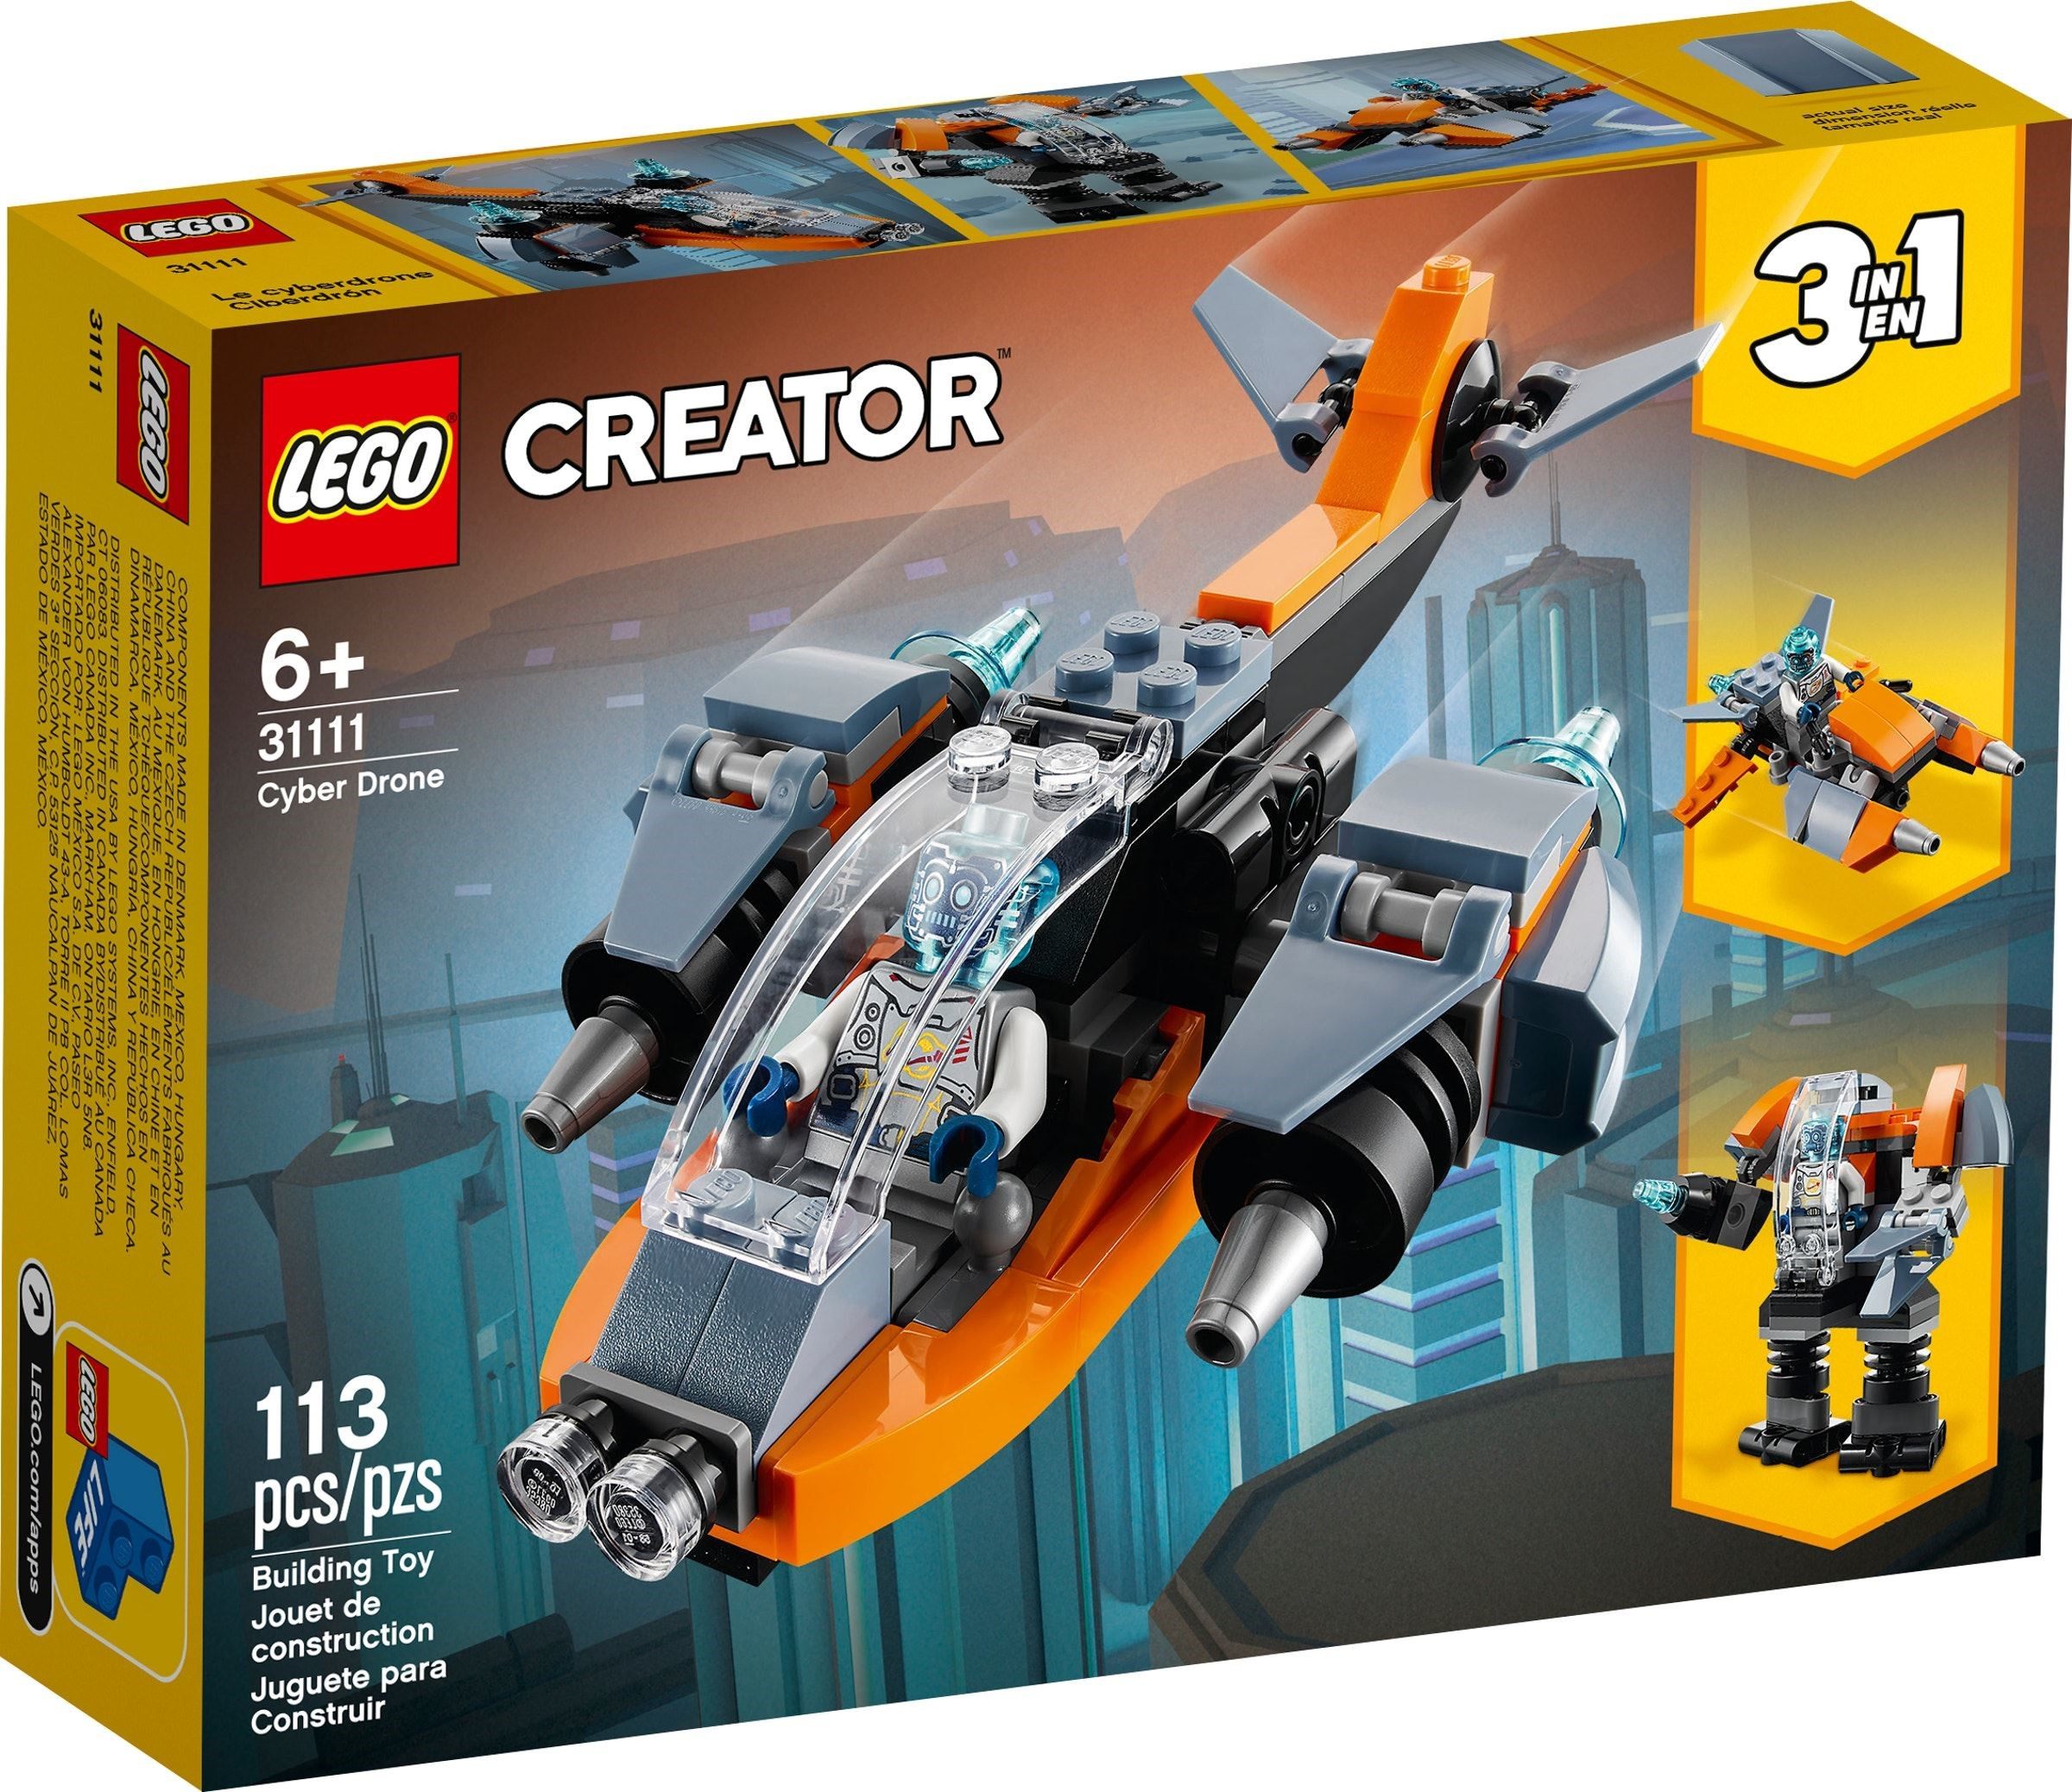 LEGO Creator - Cyber Drone (31111)